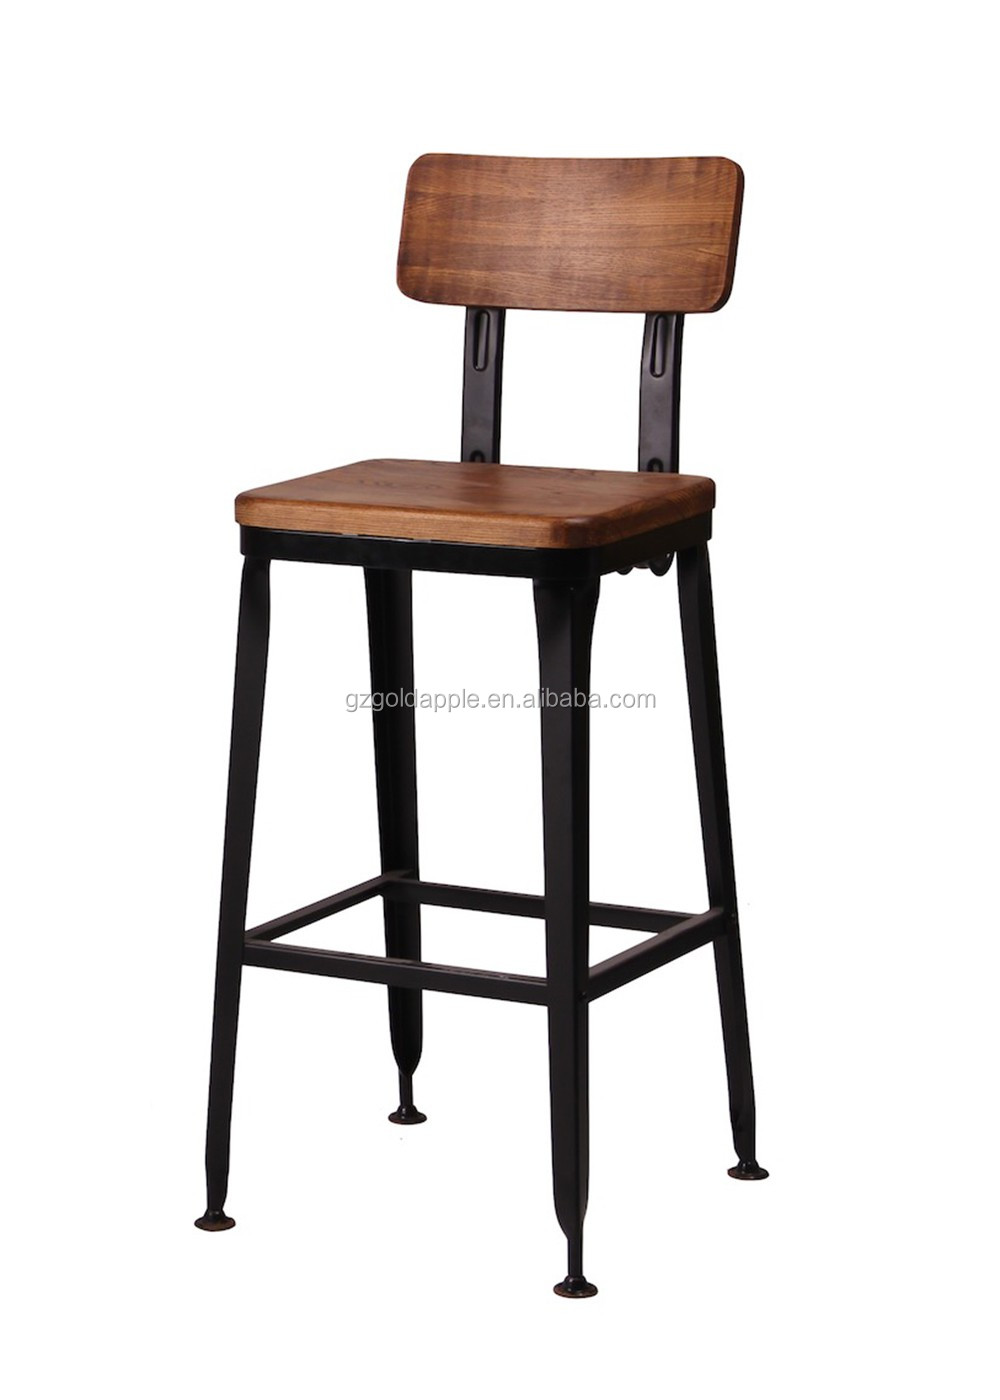 Replica industrial metal lyon high chair, vintage lyon bar chair ...